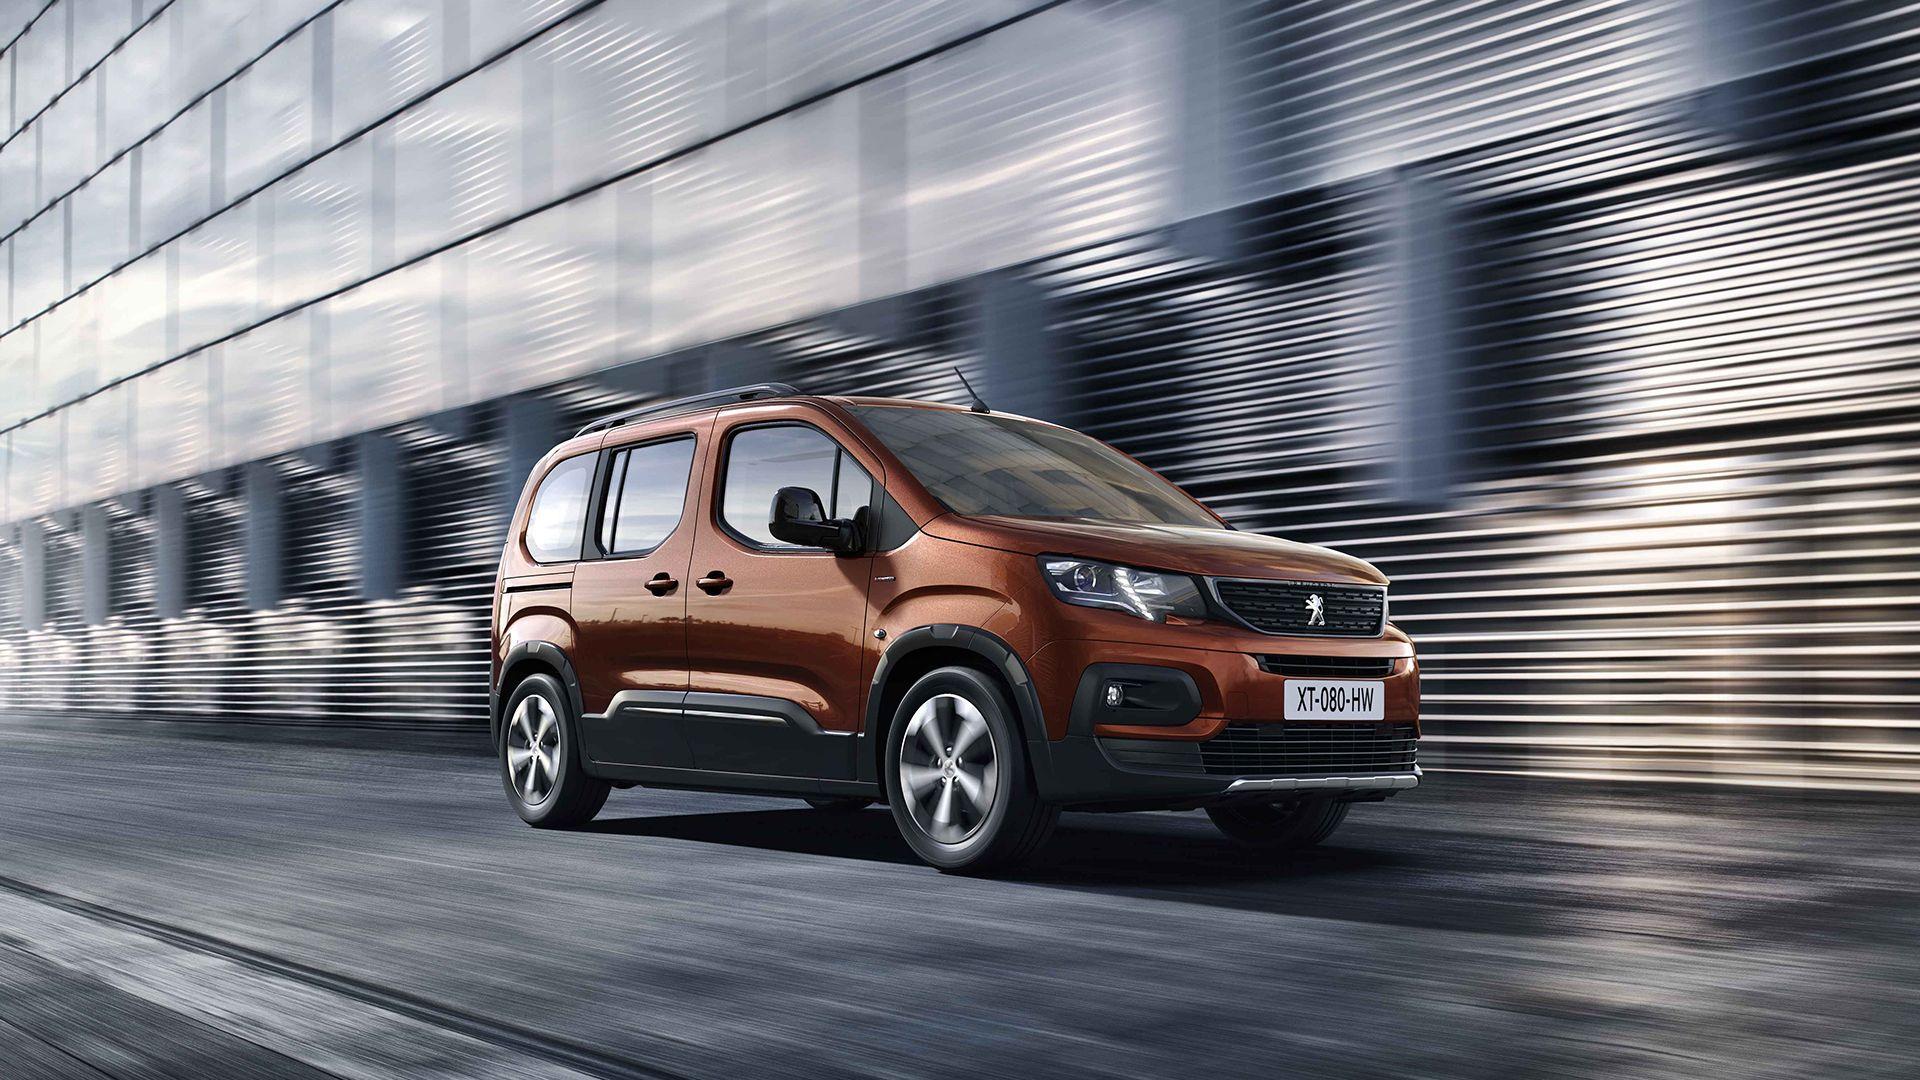 El Peugeot Partner se renueva y pasa a llamarse Rifter